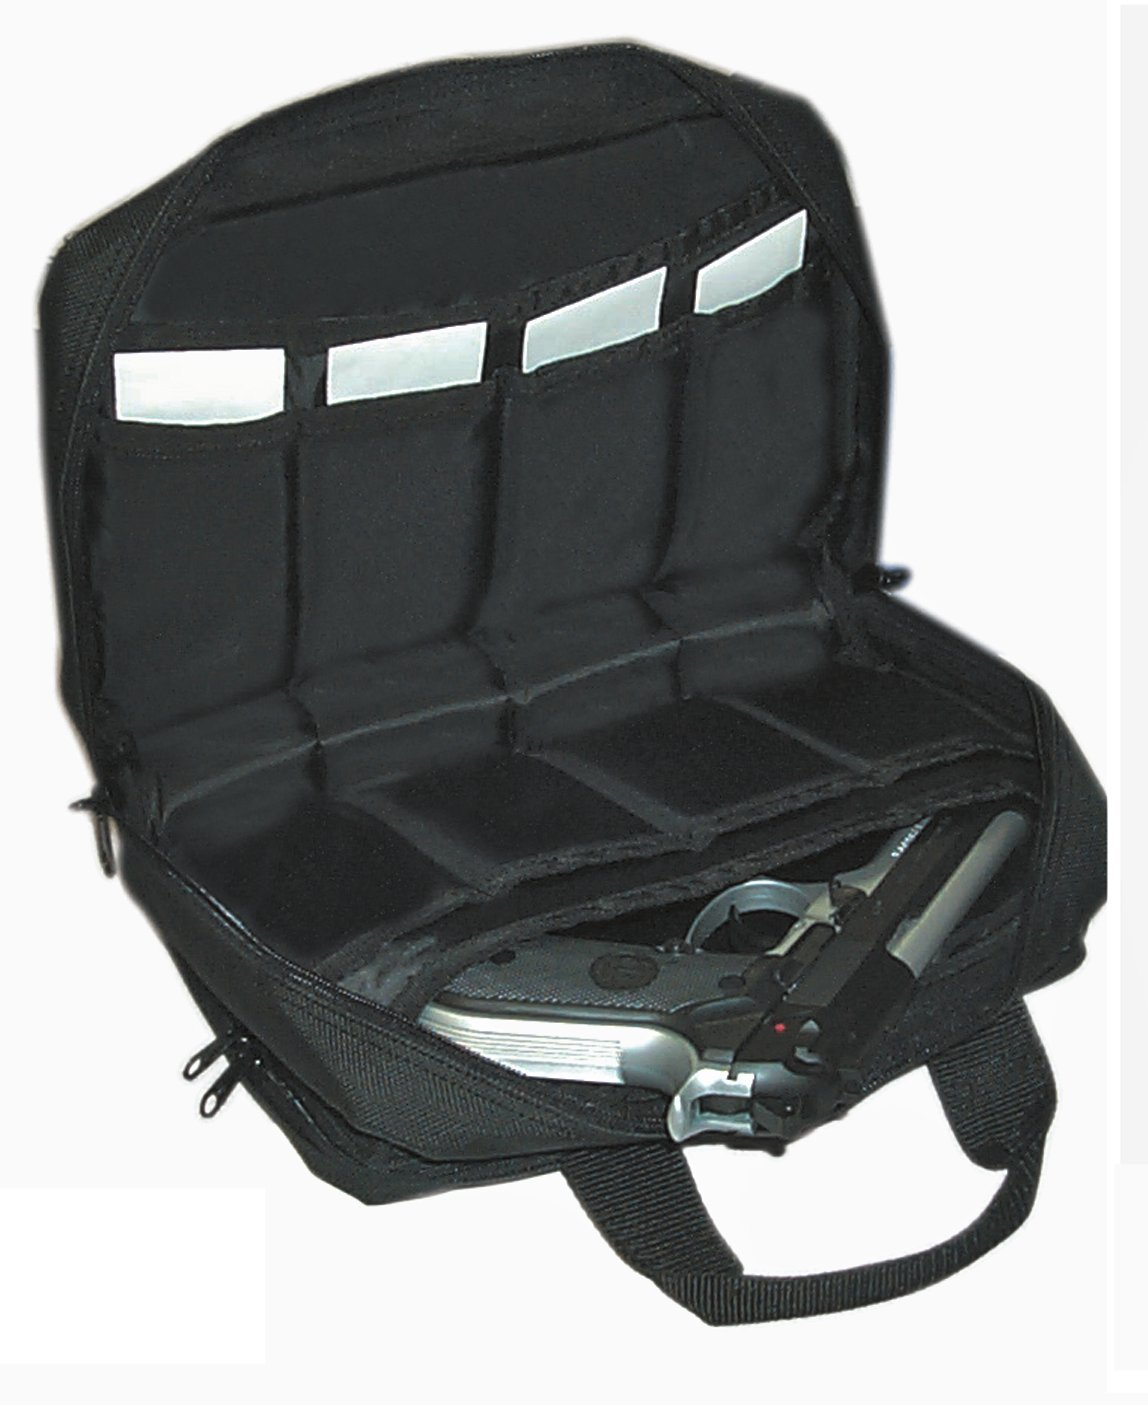 Amazon Galati Gear Deluxe Pistol Case Soft Cases Sports Outdoors